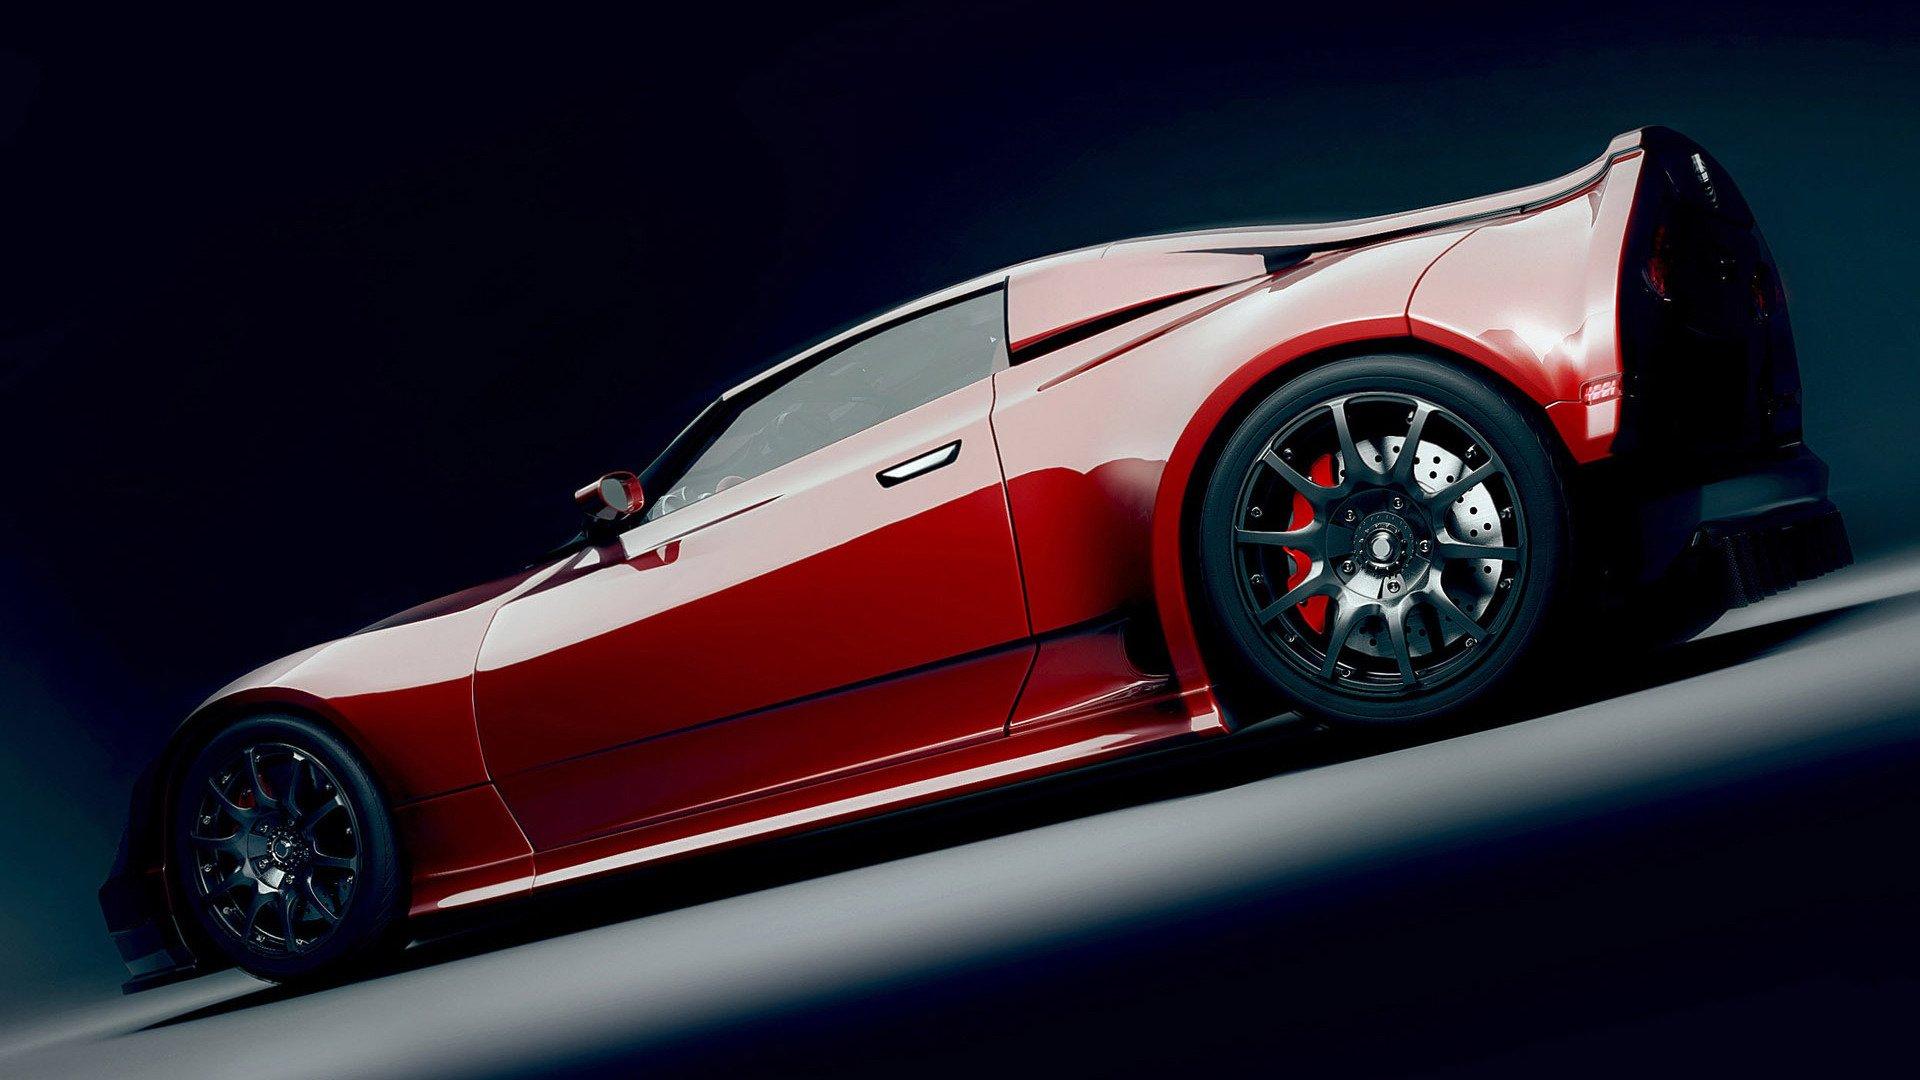 Corvette Full HD Wallpaper and Background Image ...